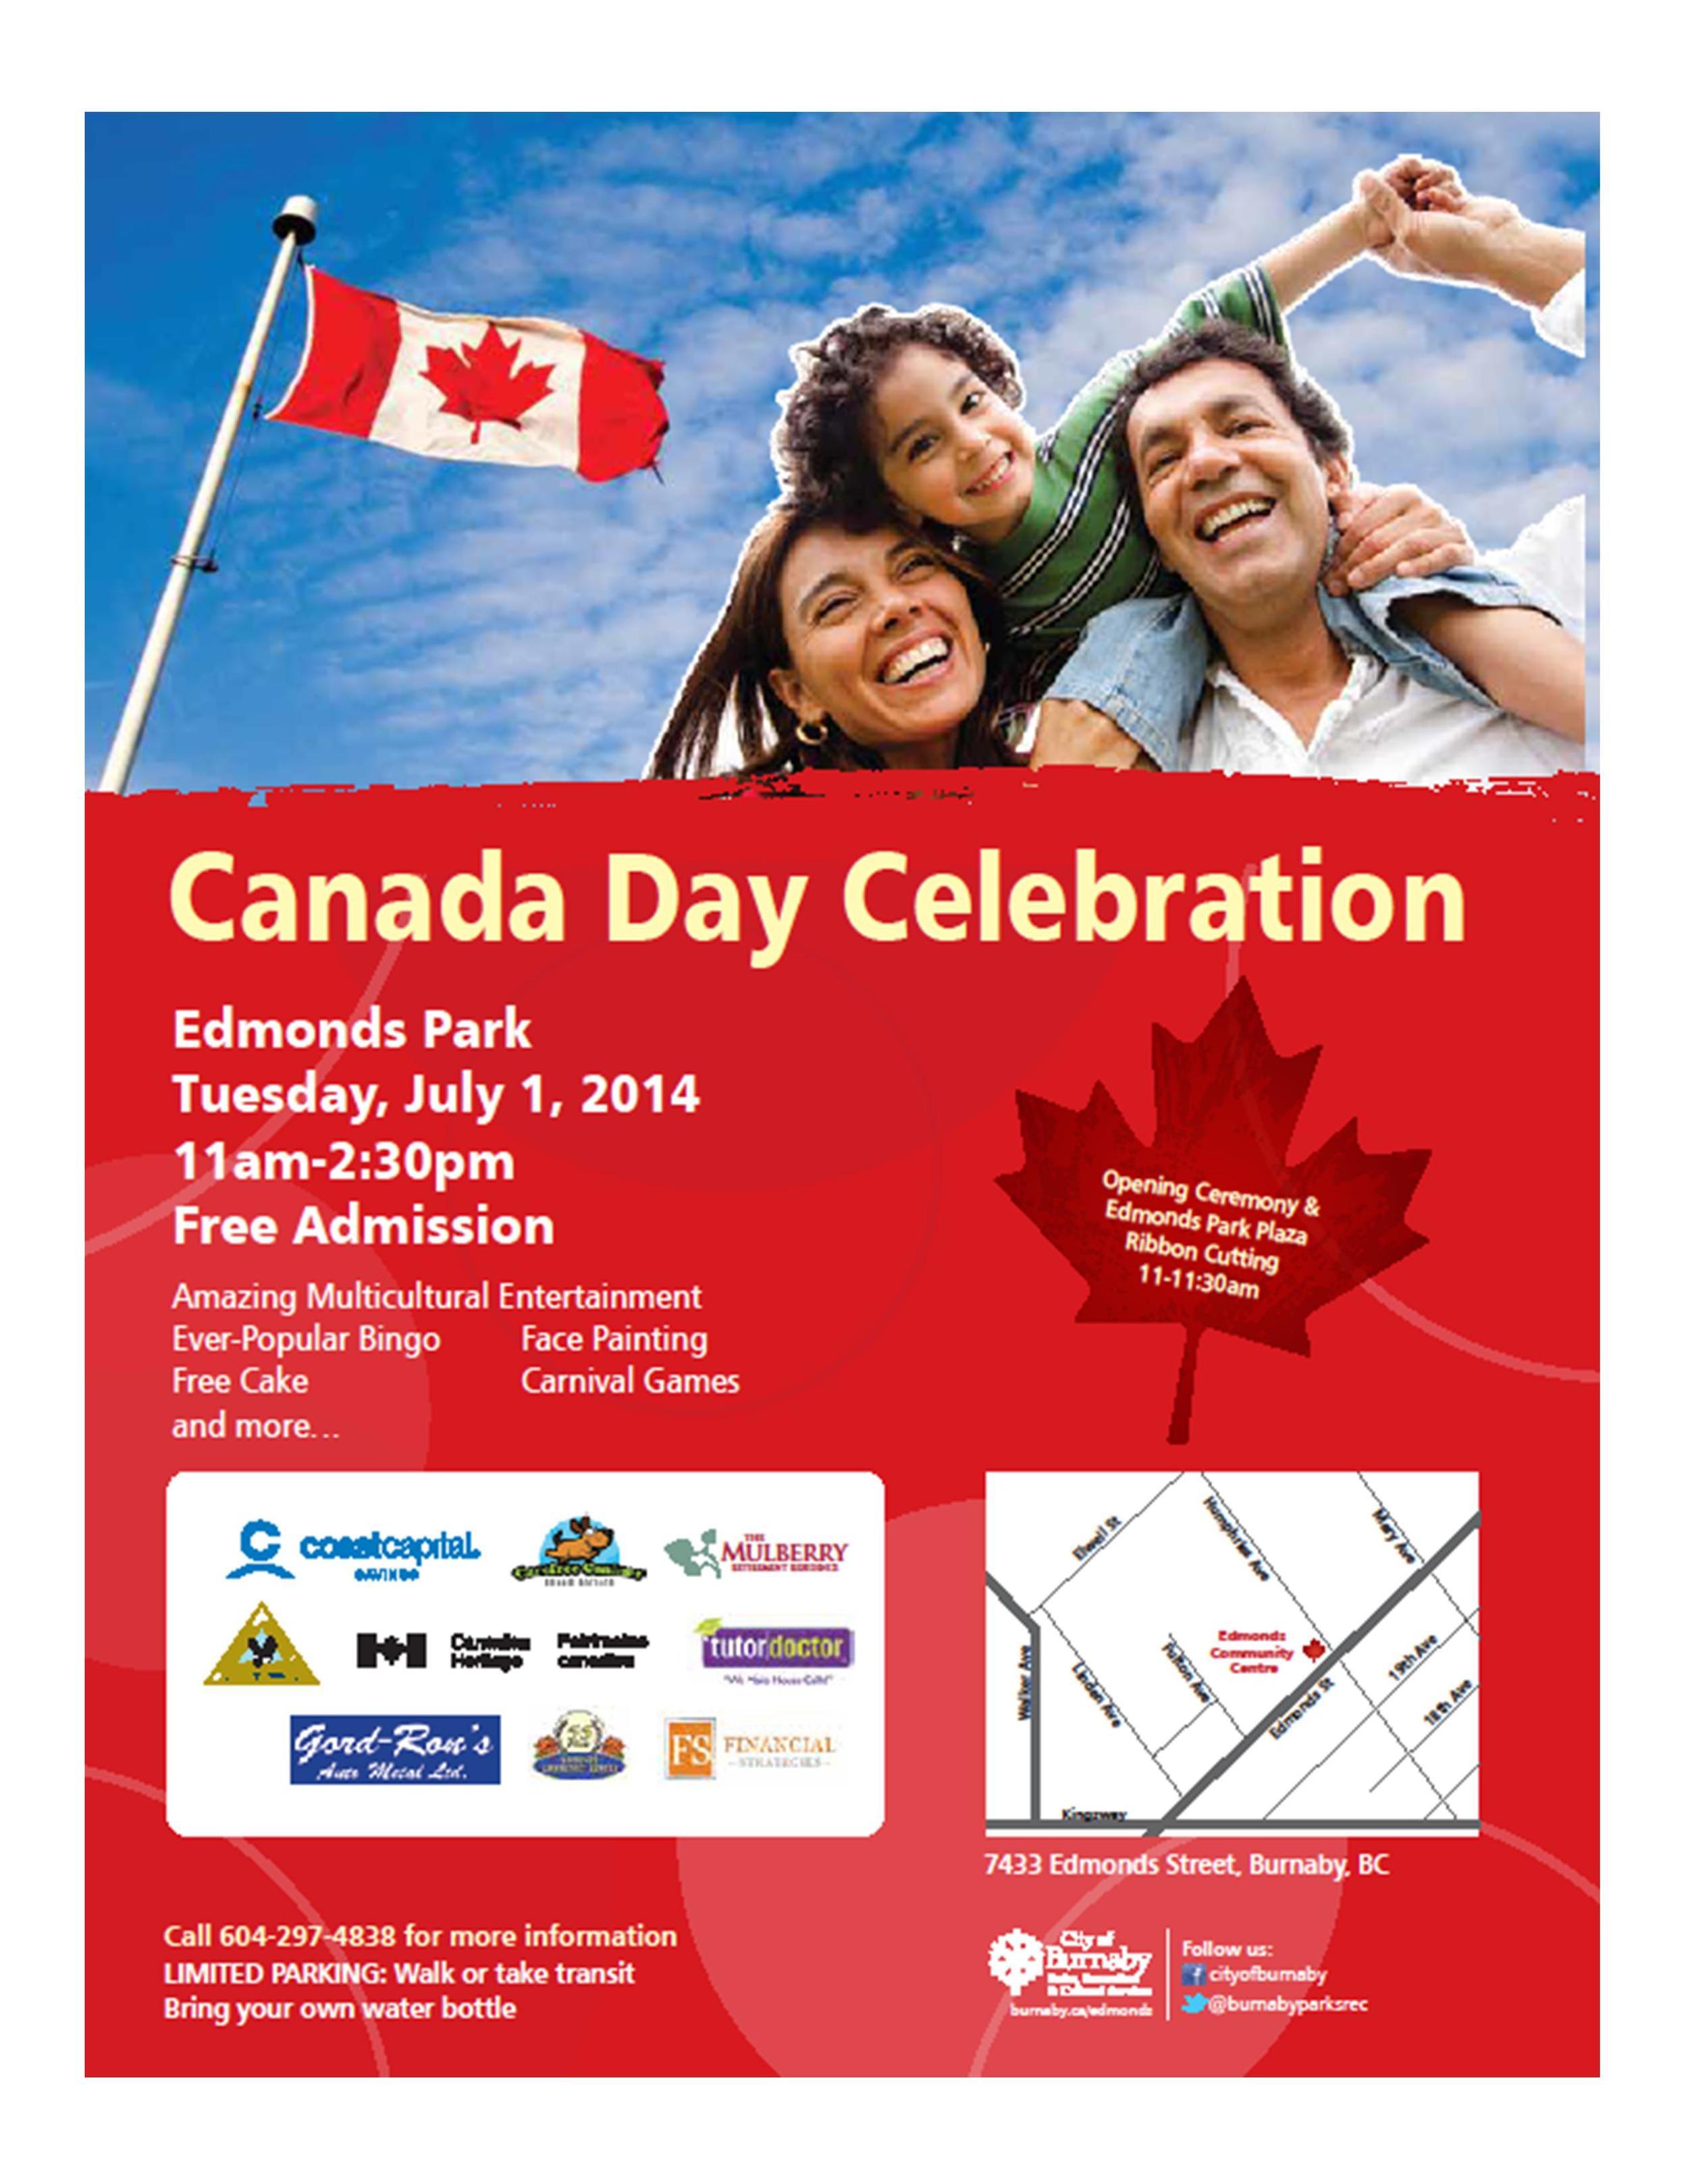 Canada Day jpeg.jpg